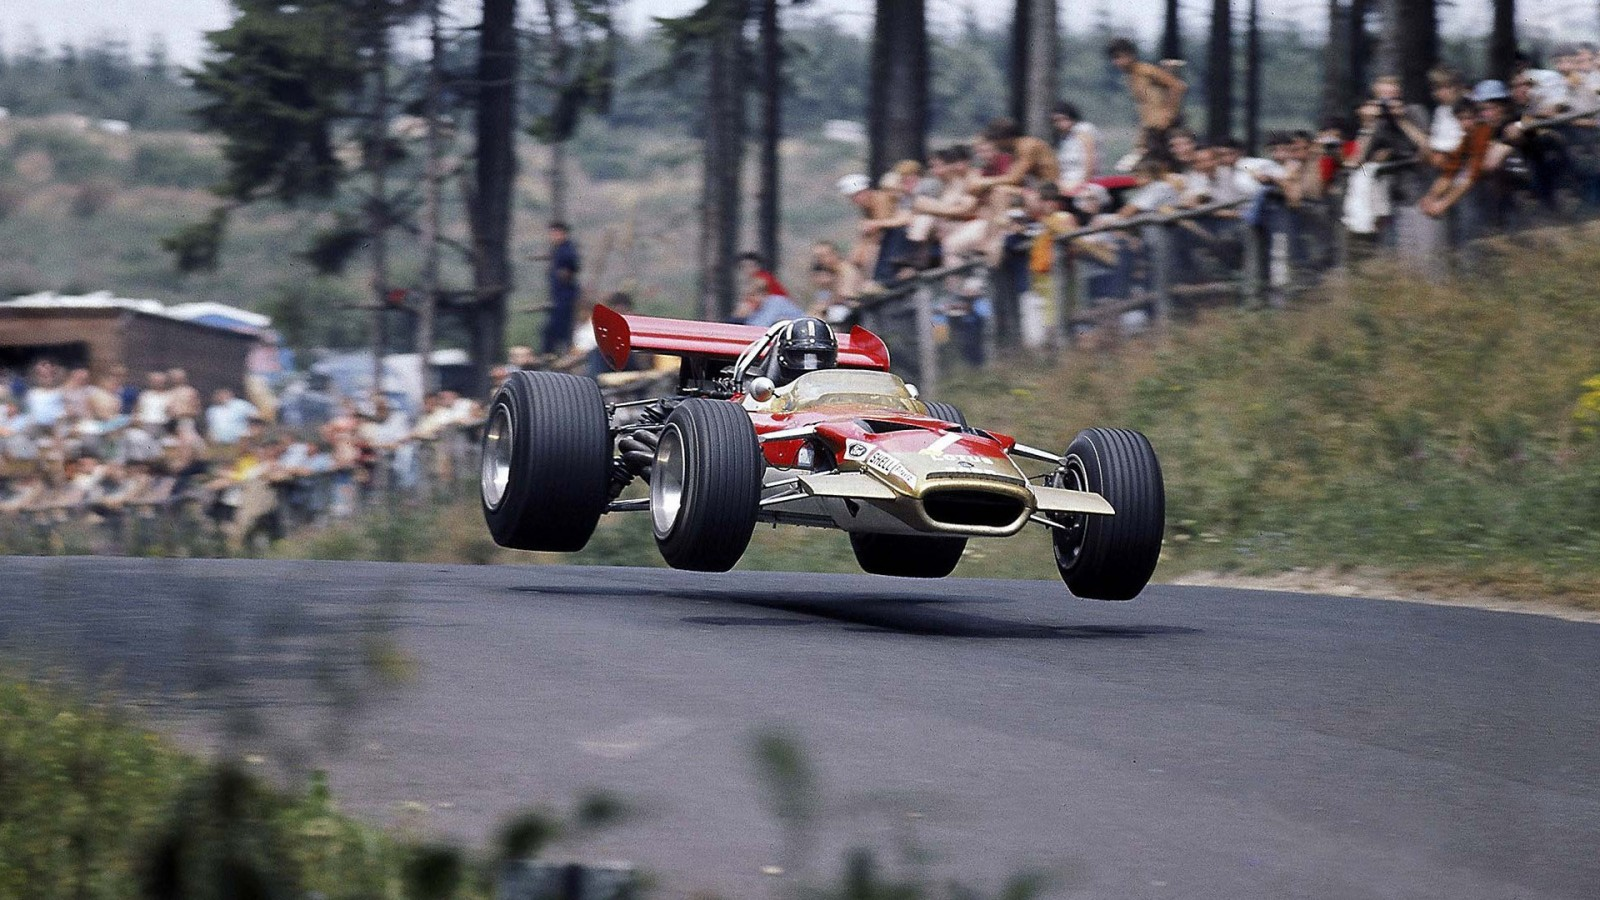 Graham Hill driving the Lotus 49 in 1969 1600x900 - Desktop Wallpaper: Graham Hill Flying The Lotus 49